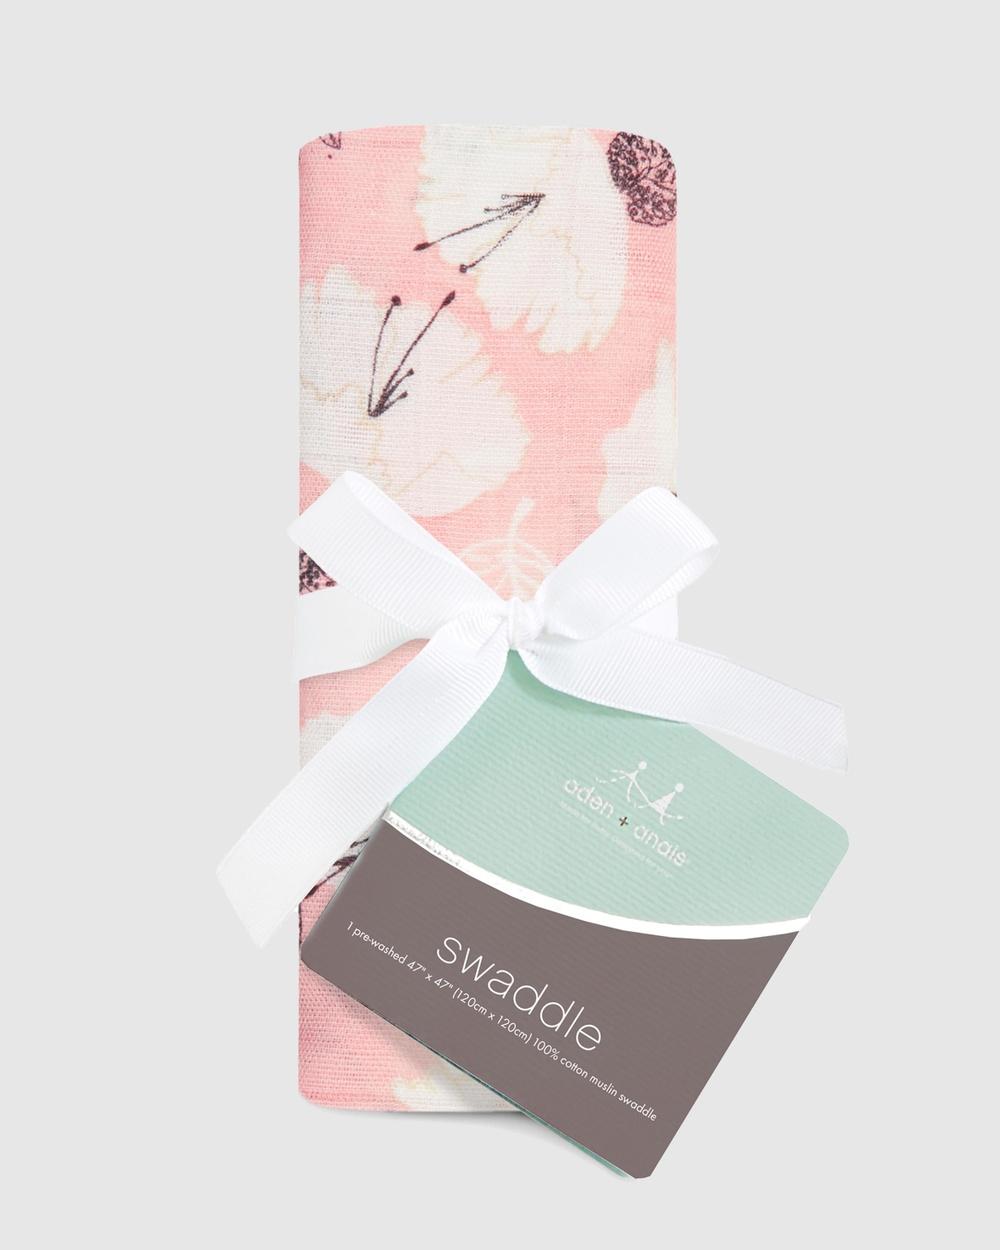 Aden & Anais Single Silky Soft Swaddle Wraps Blankets Pretty Petals